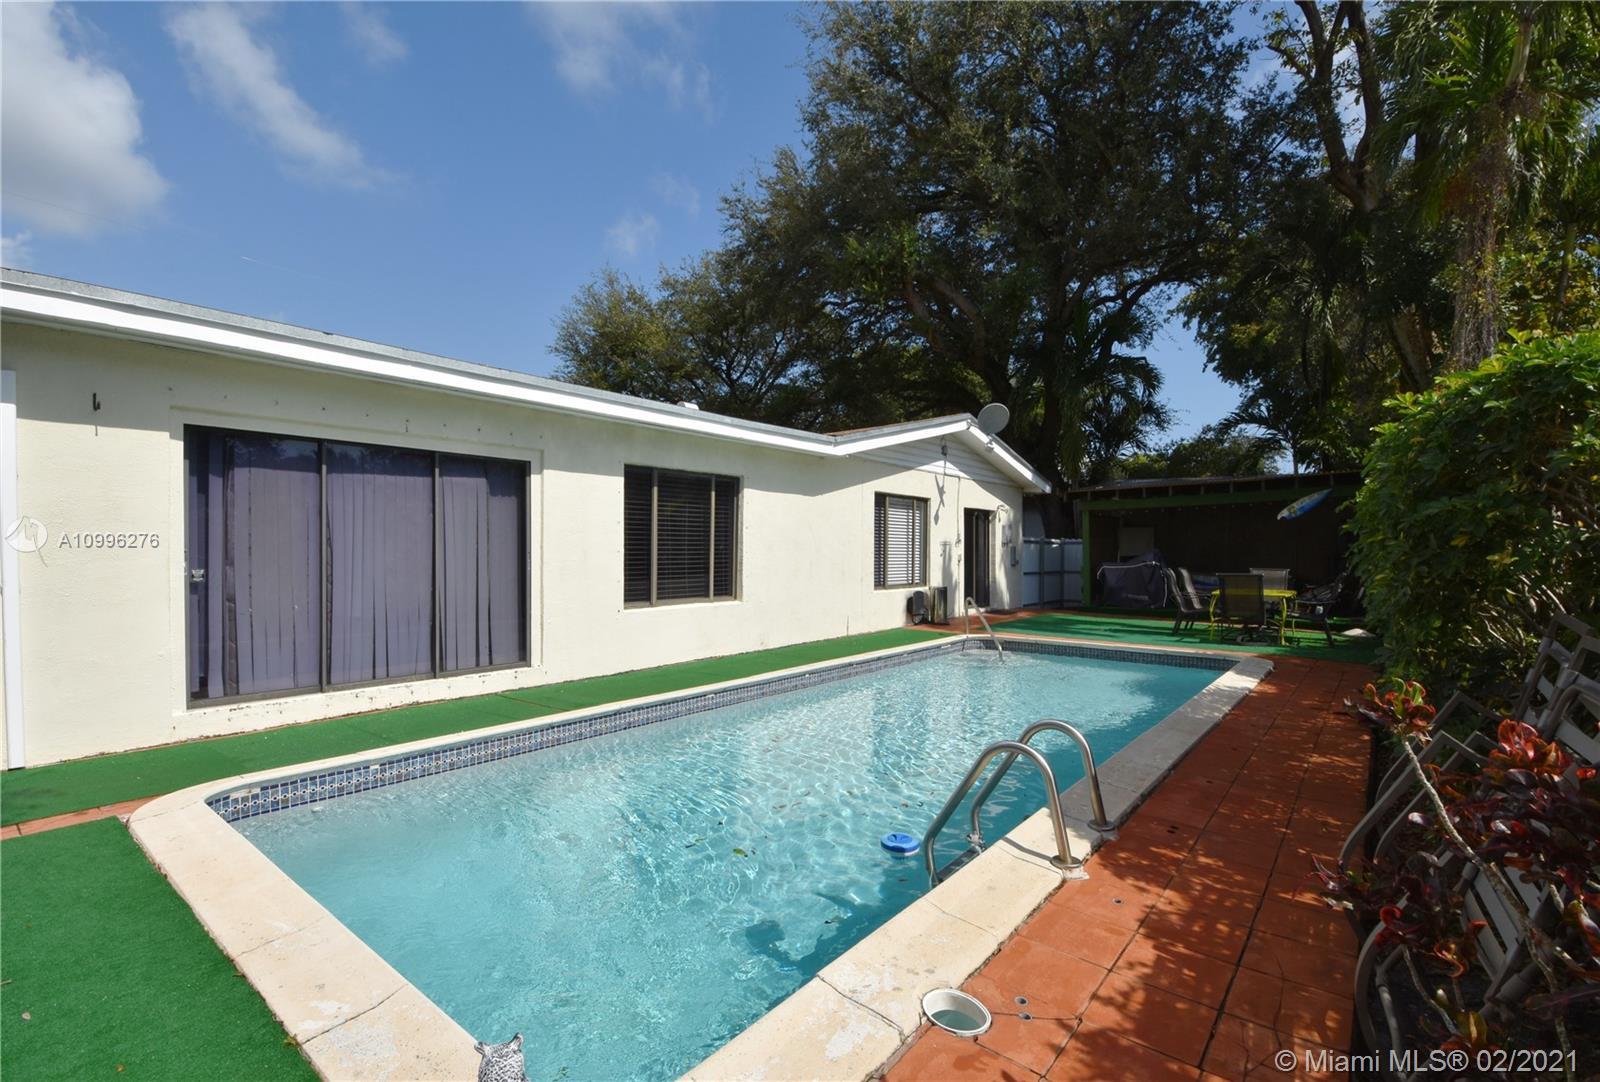 Sky Lake, 2110 NE 191st Dr, North Miami Beach, Florida 33179, image 39